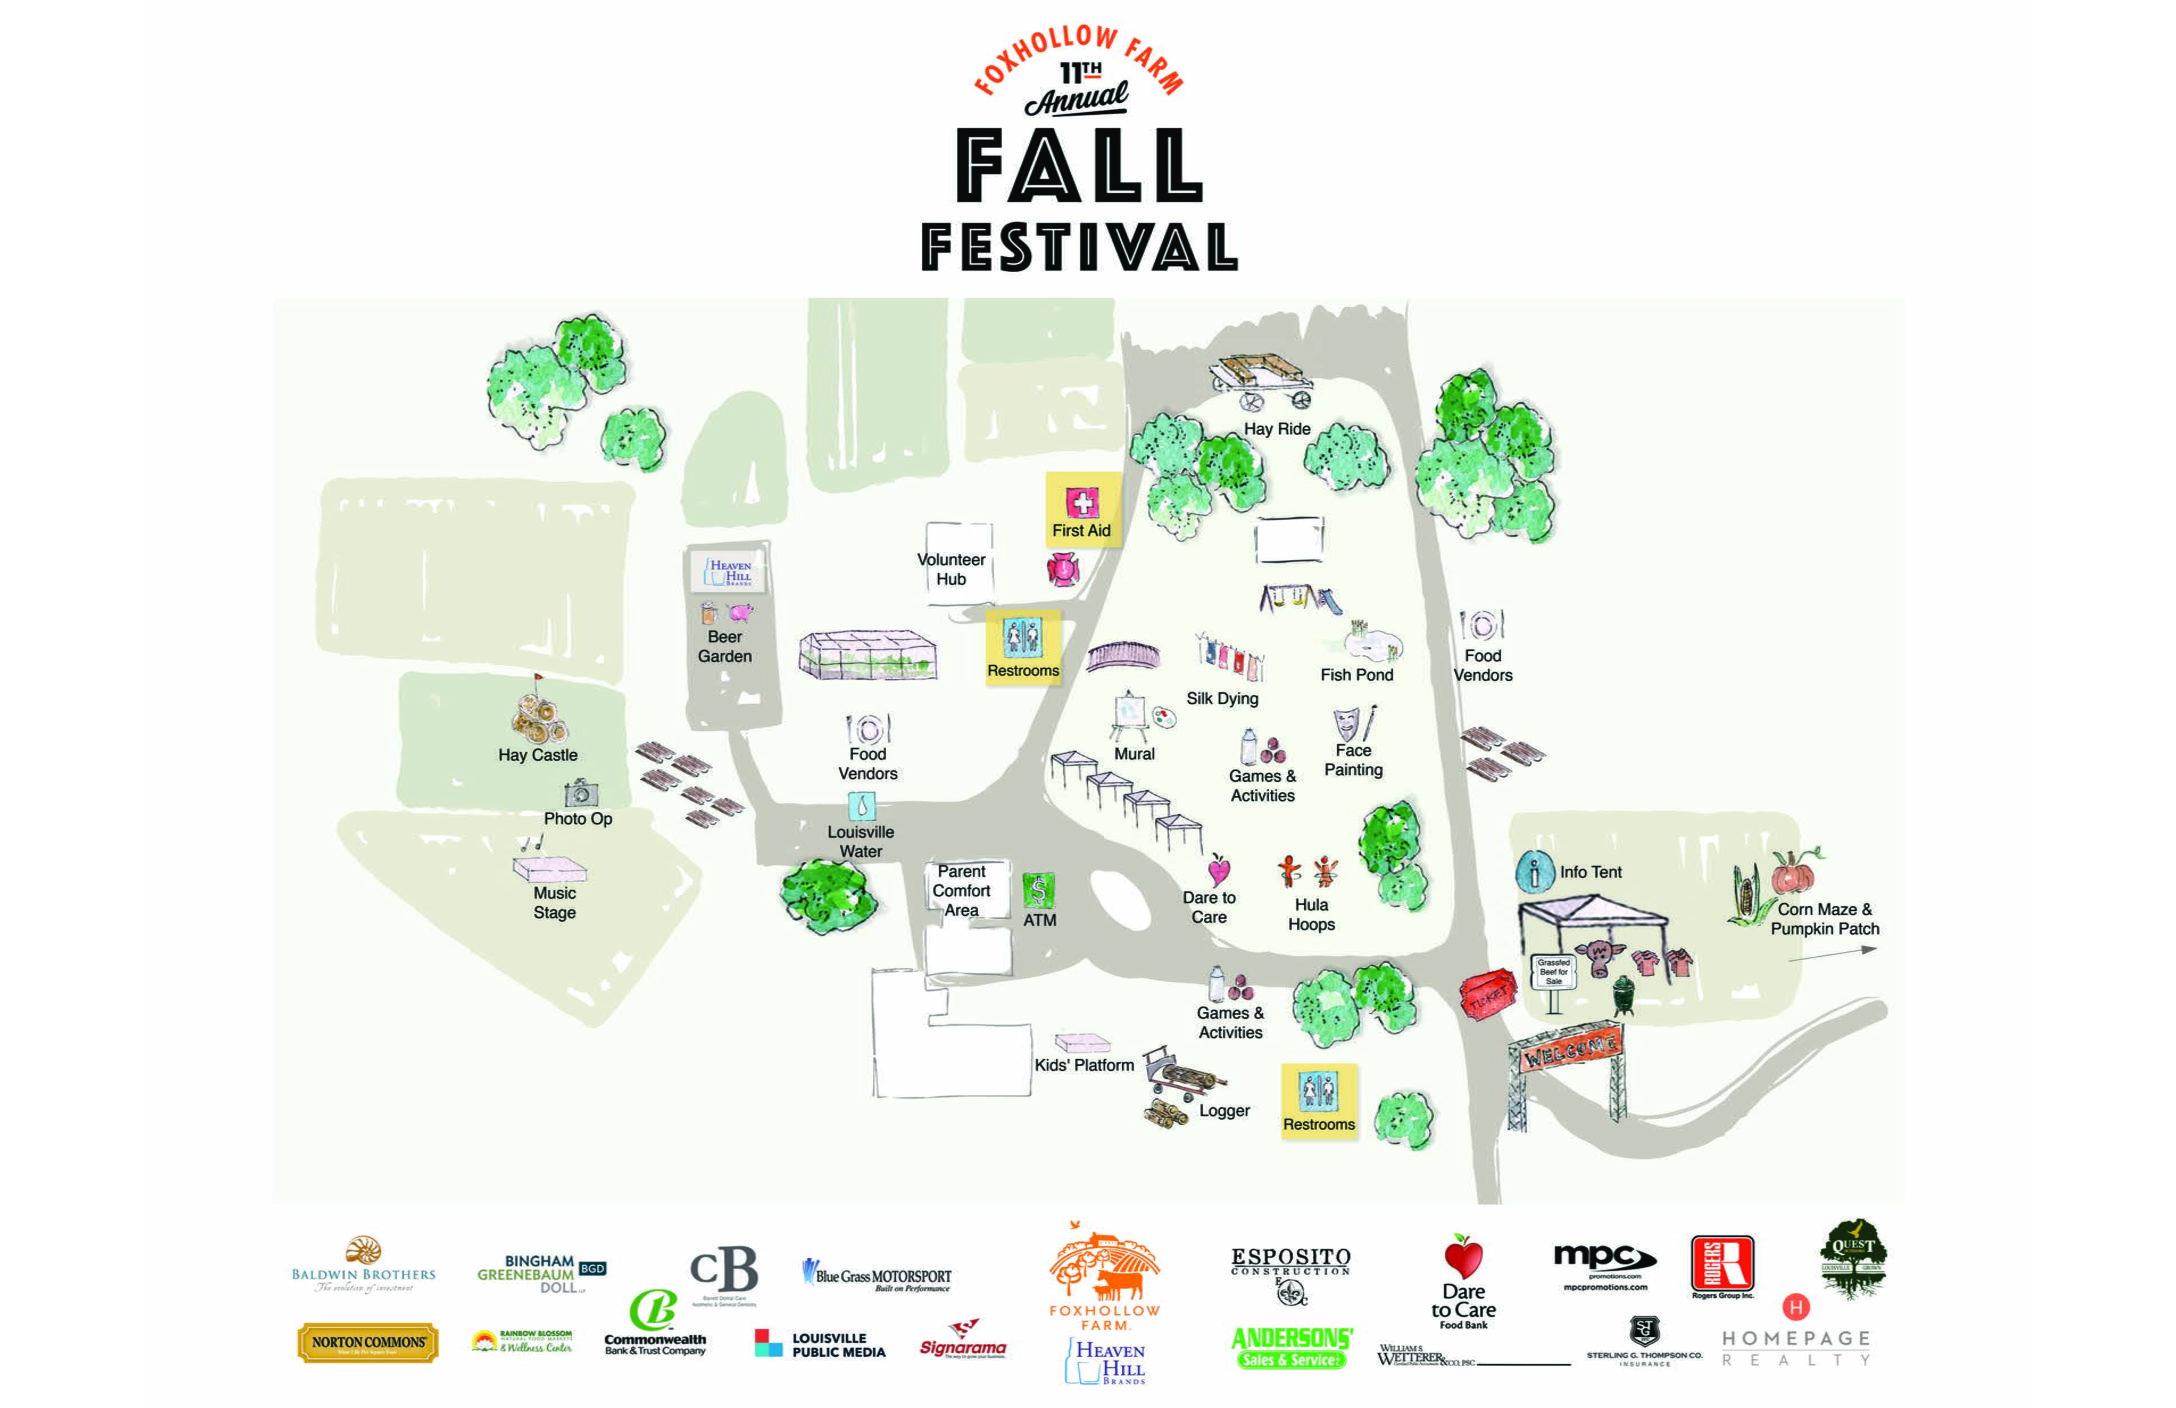 Fall Festival Map